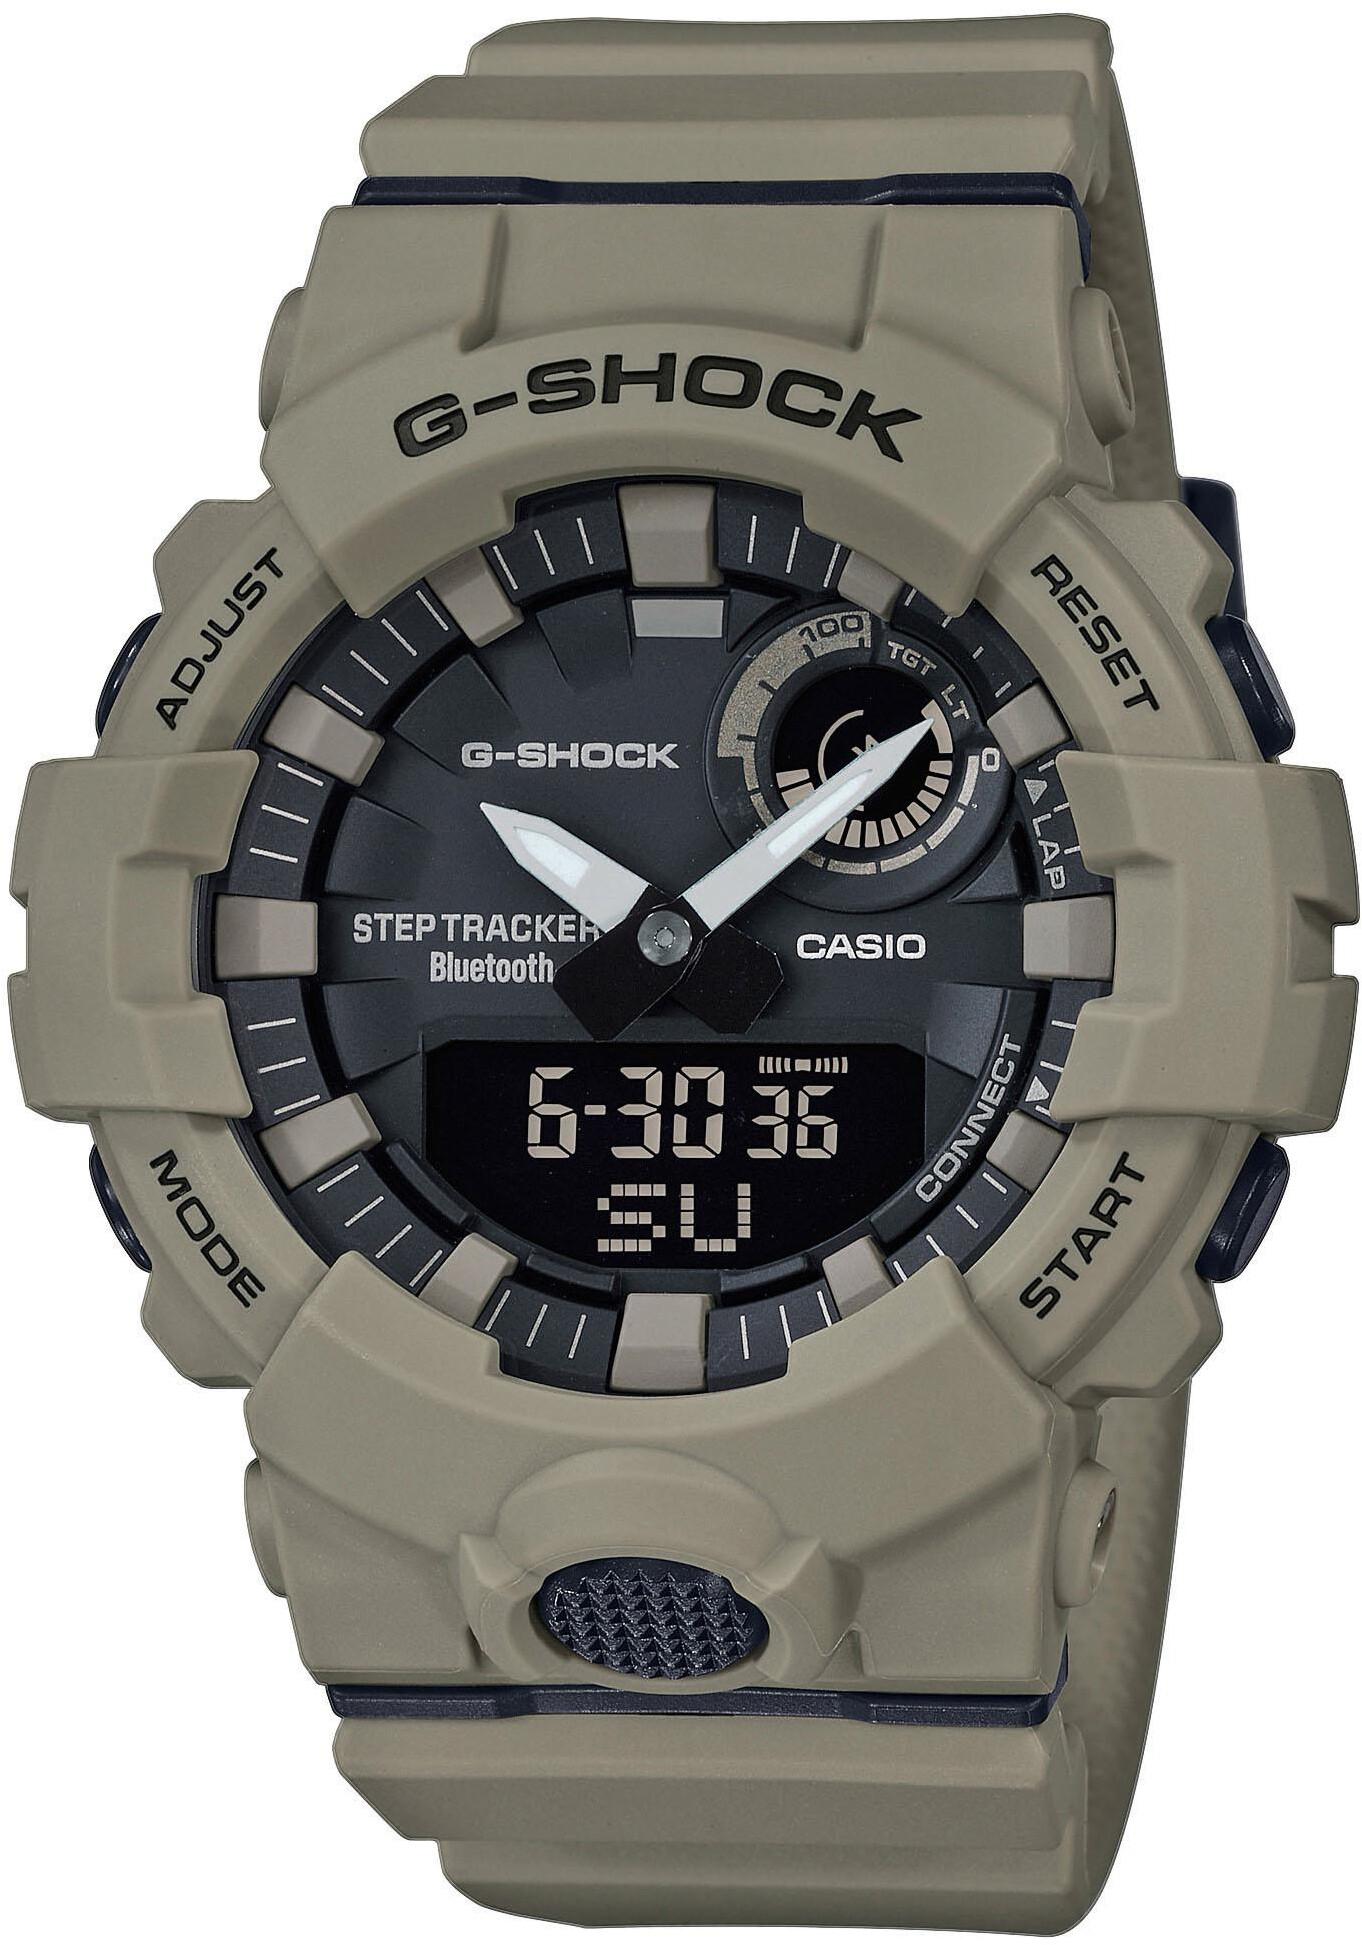 CASIO G-SHOCK GBA-800UC-5AER Ur Herrer, brown/brown/black (2019)   Sports watches